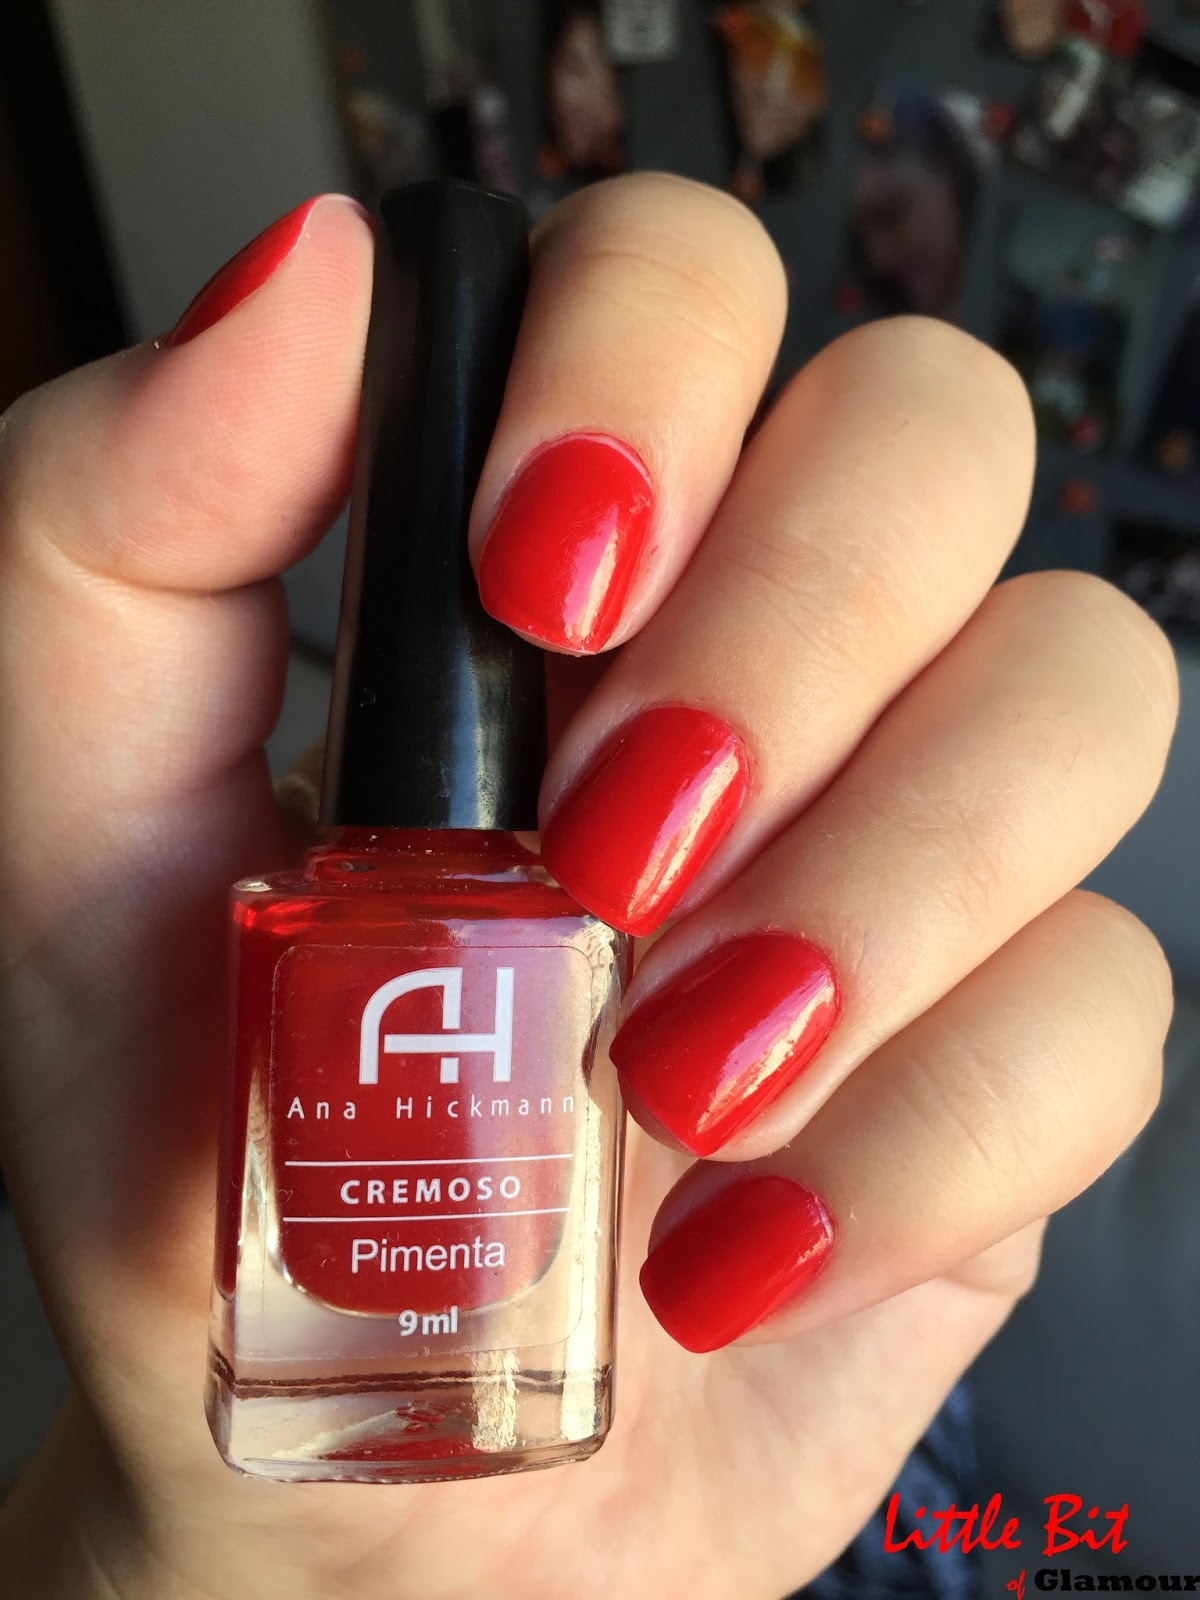 Little Bit of Glamour  Esmalte da Semana  Pimenta, Ana Hickmann 2f86f8a99f